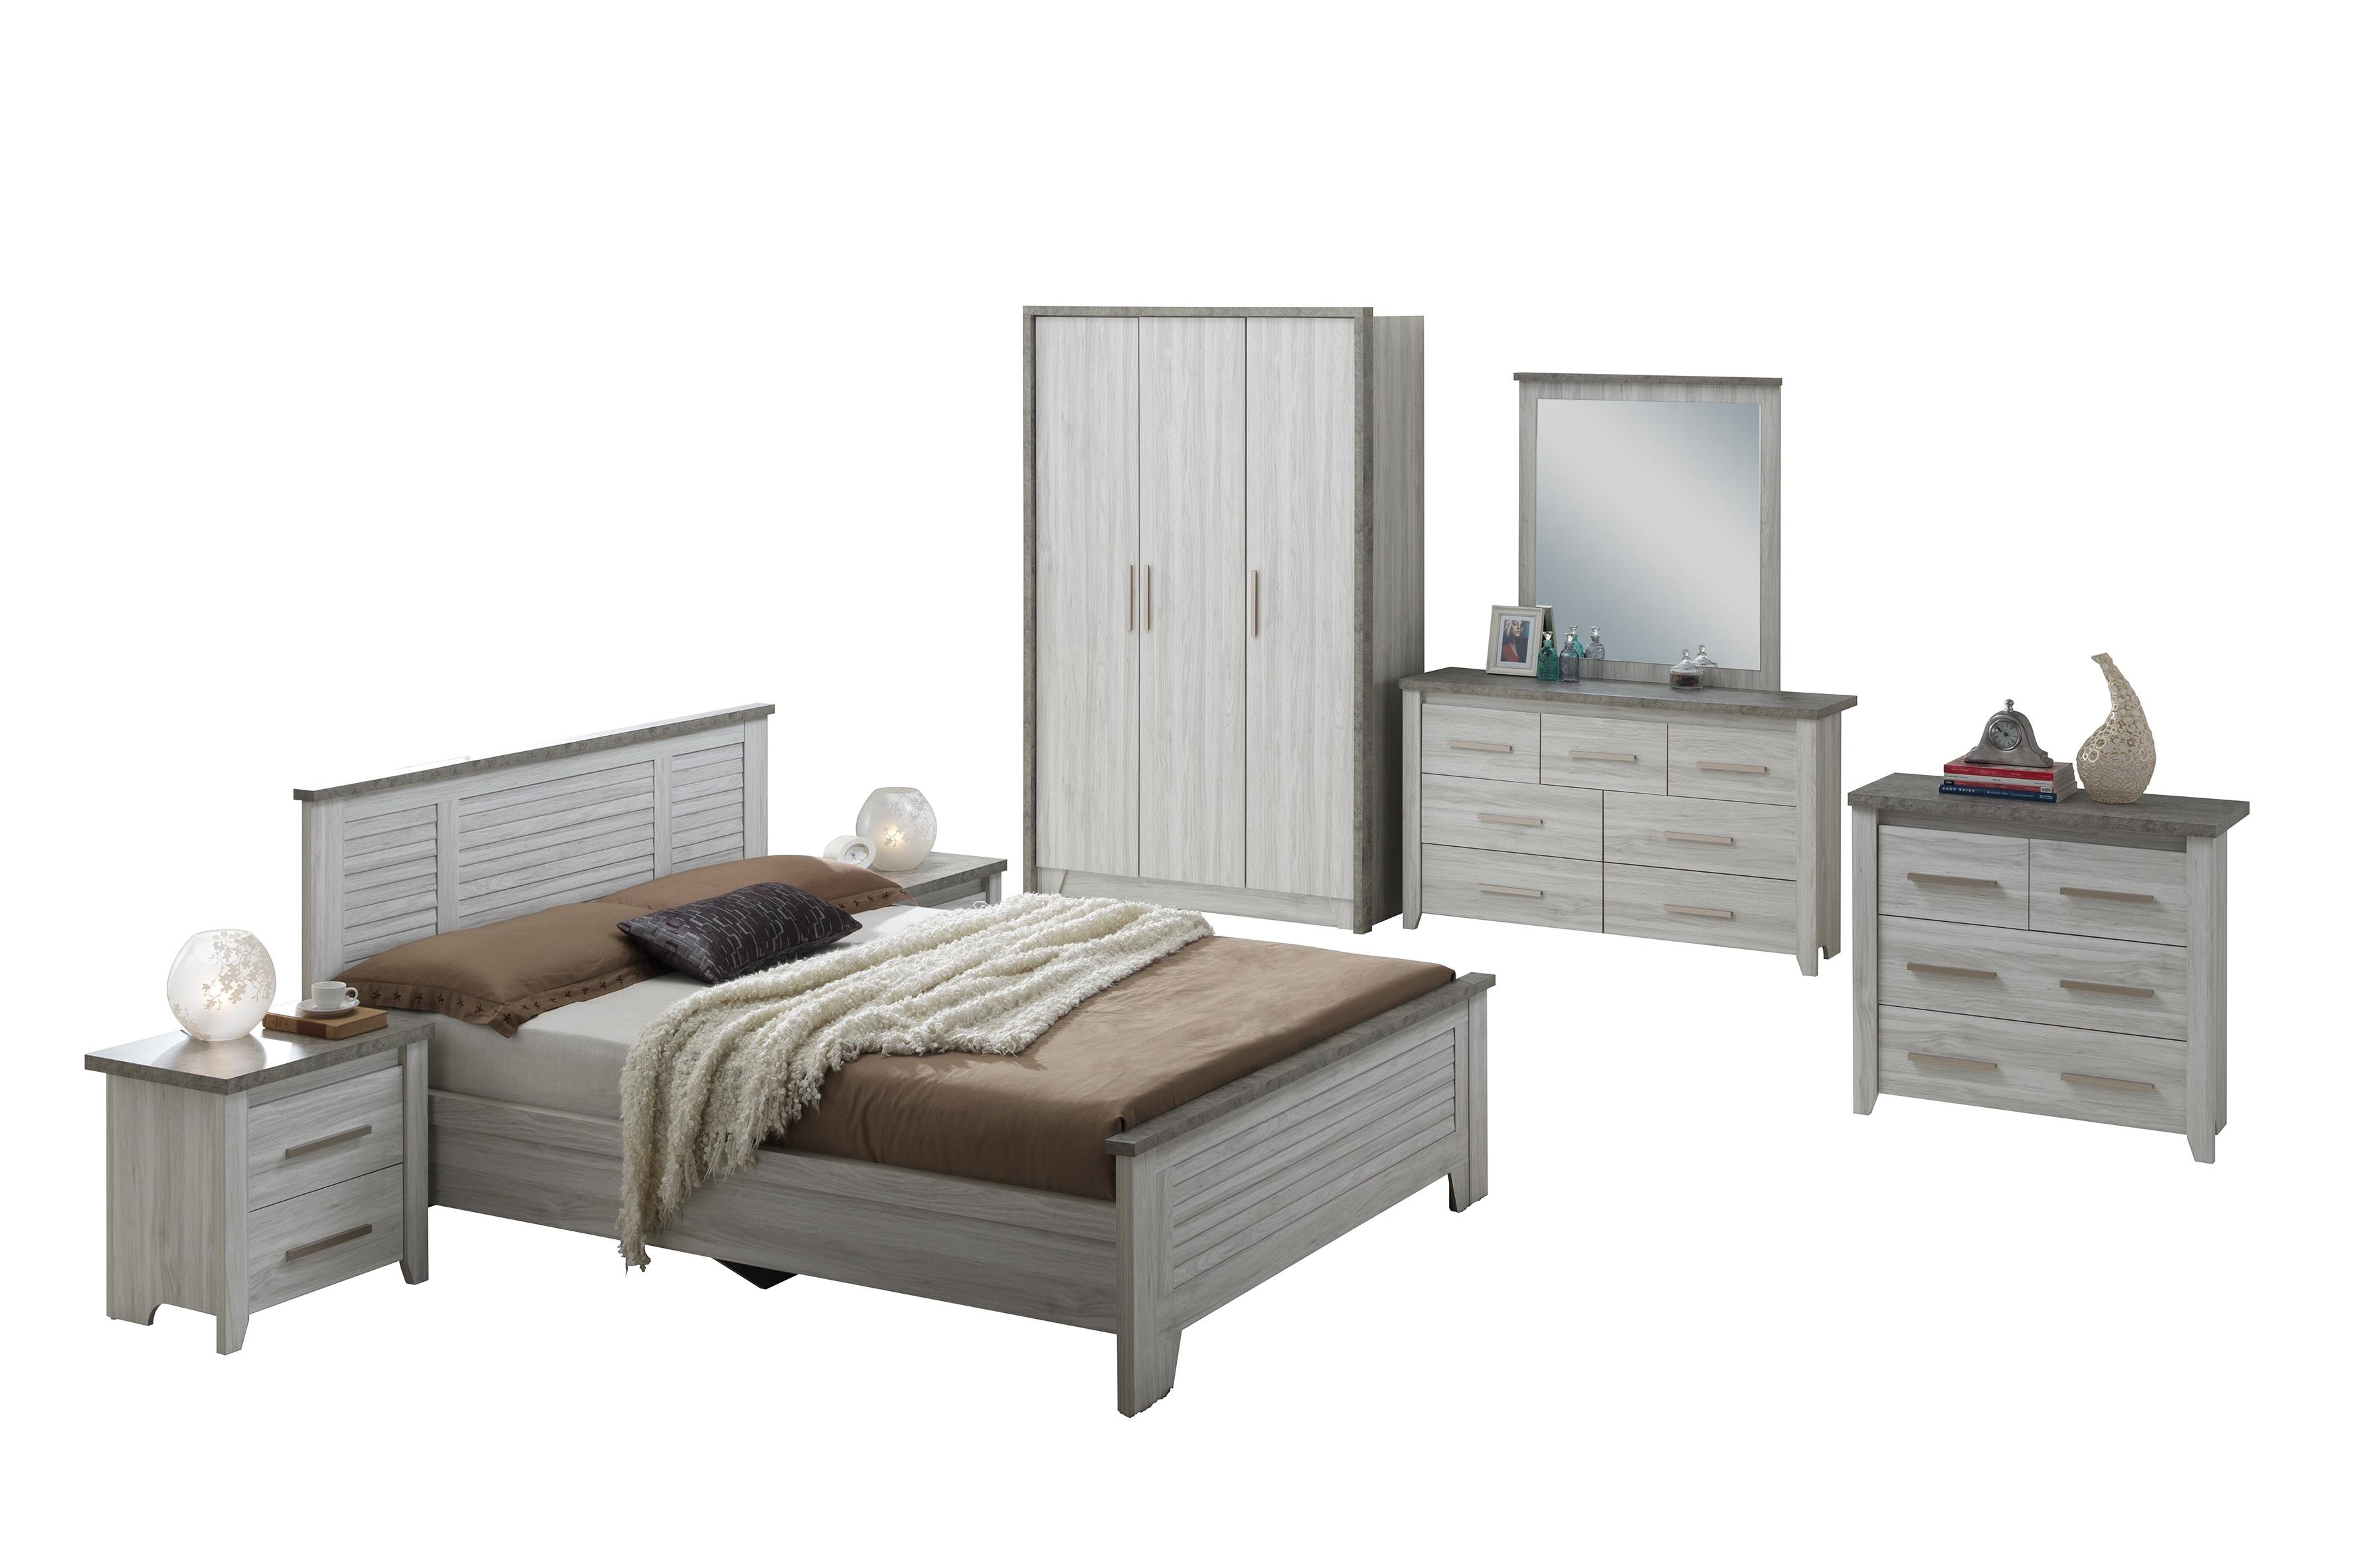 Modena Bedroom Set BEDROOM SUITES Lifestyle Furniture - Lifestyle furniture bedroom sets